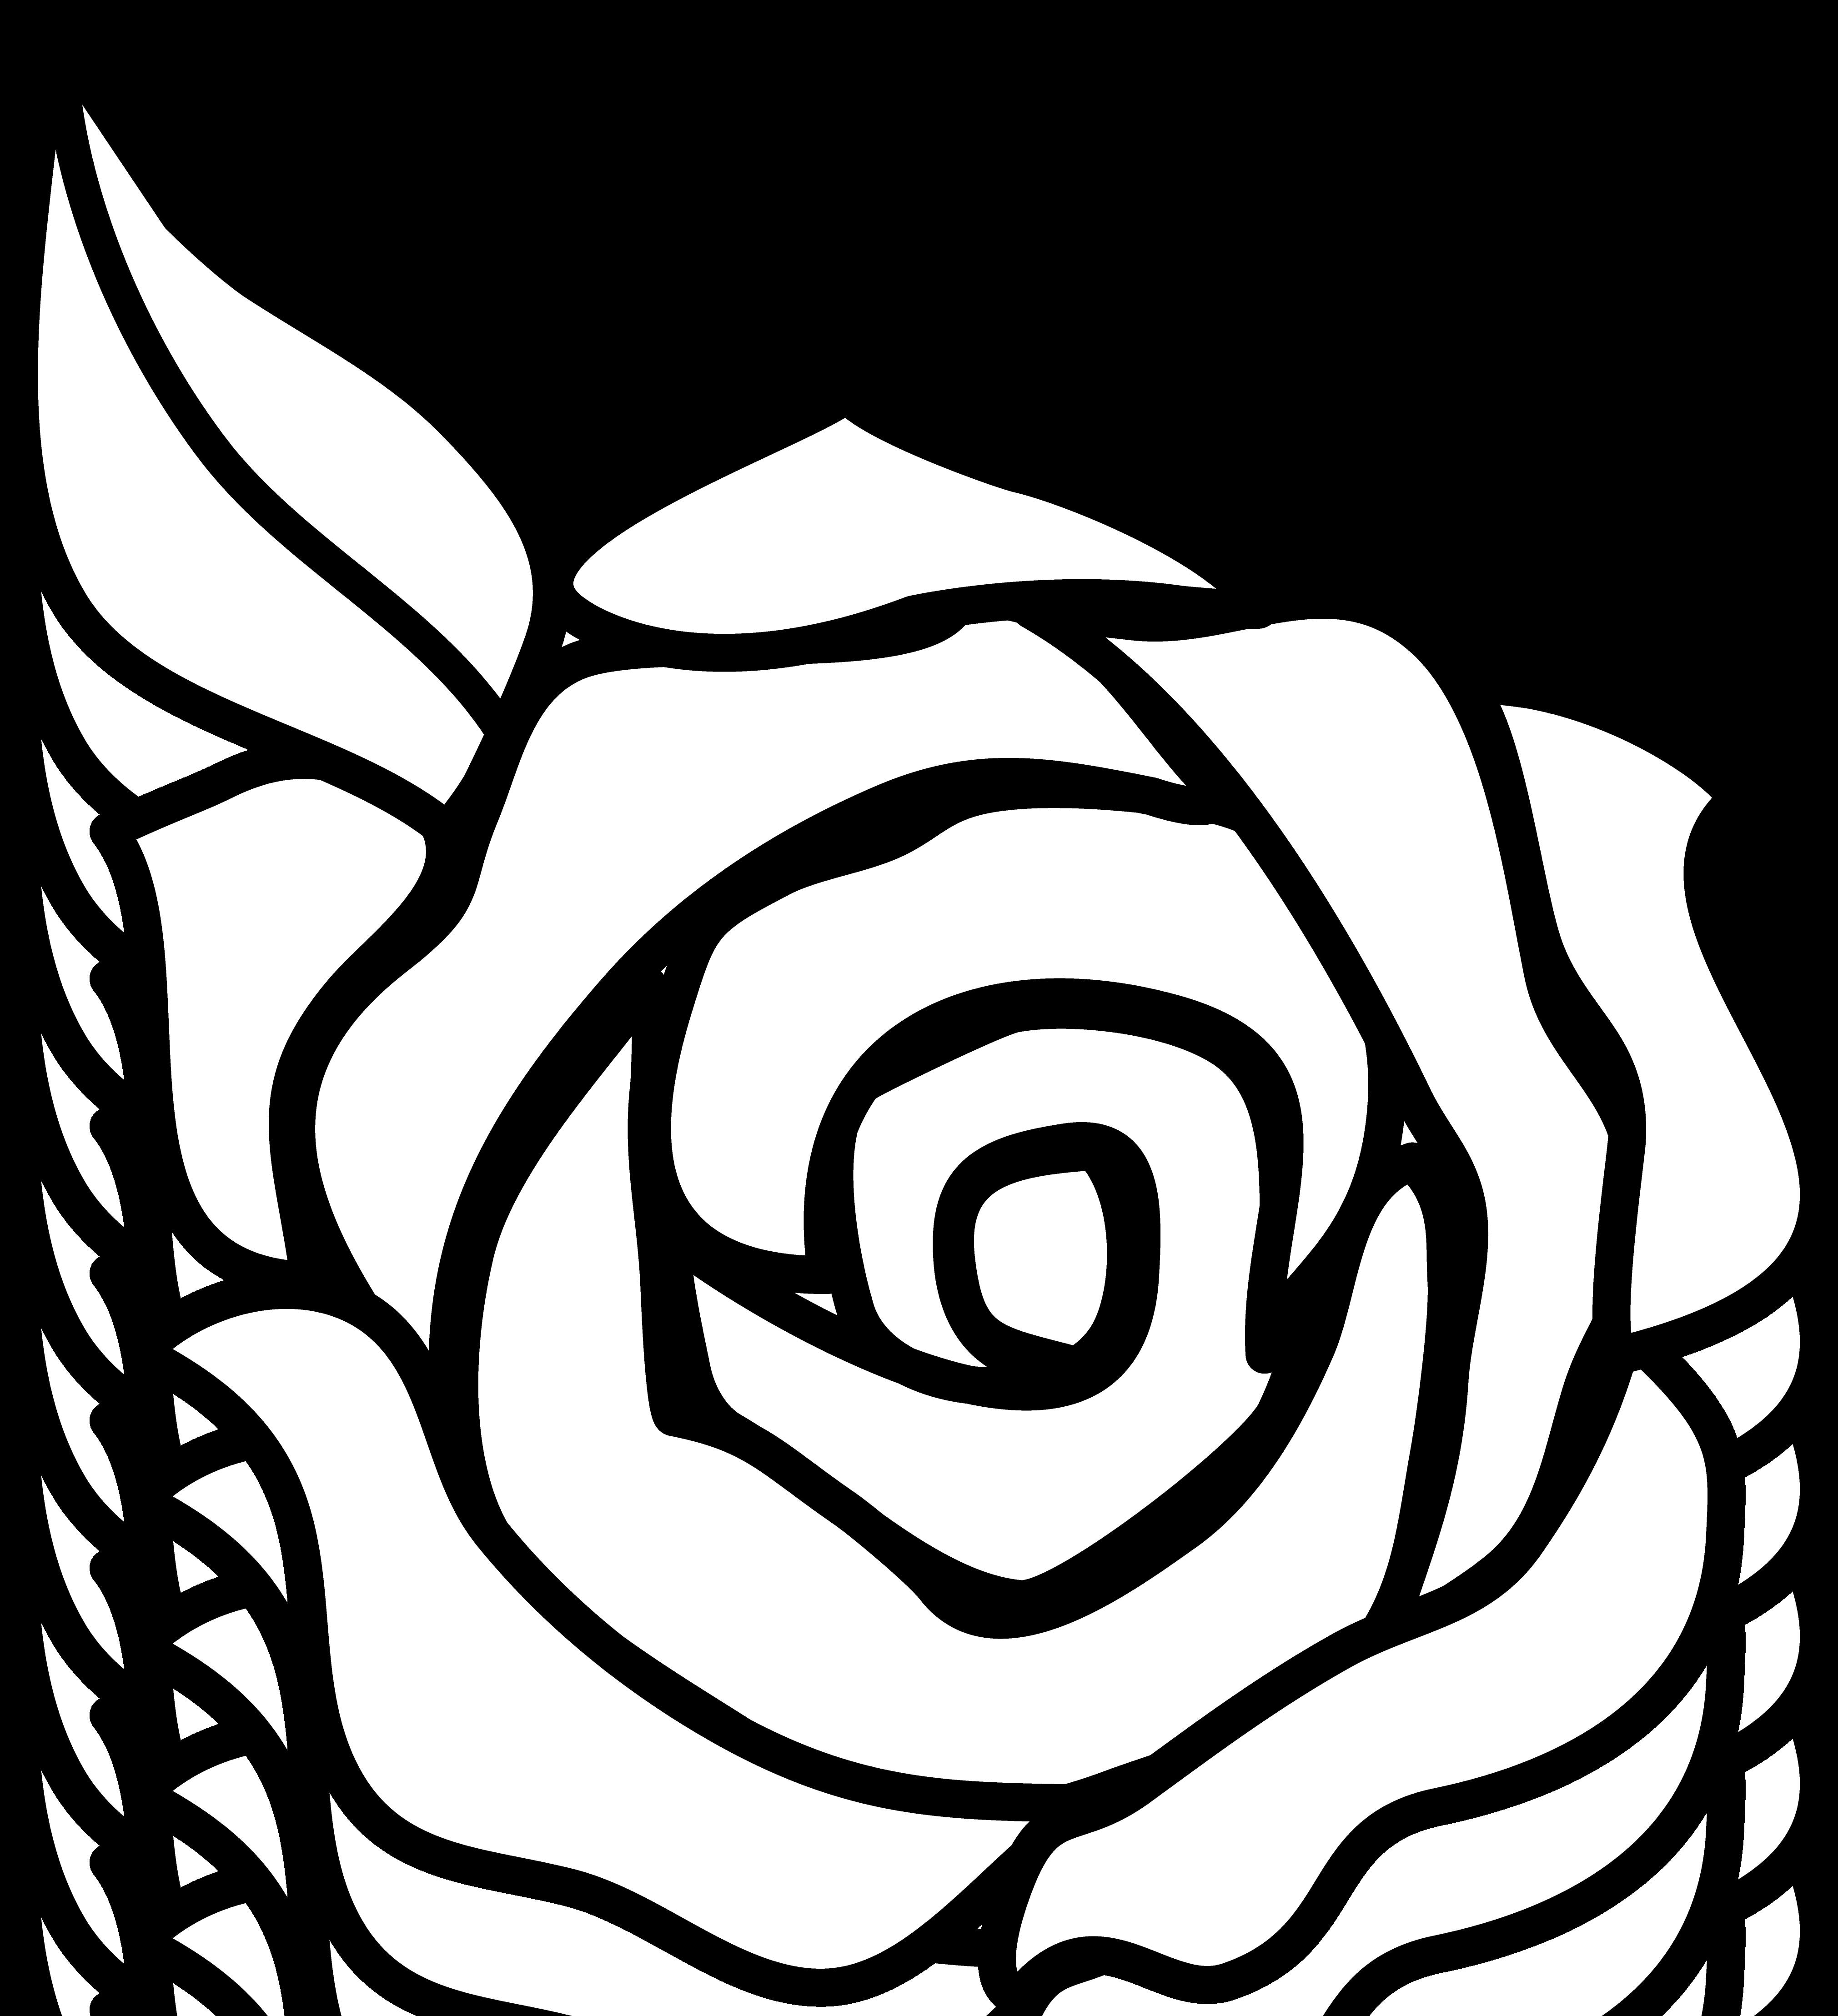 Free rose outline.